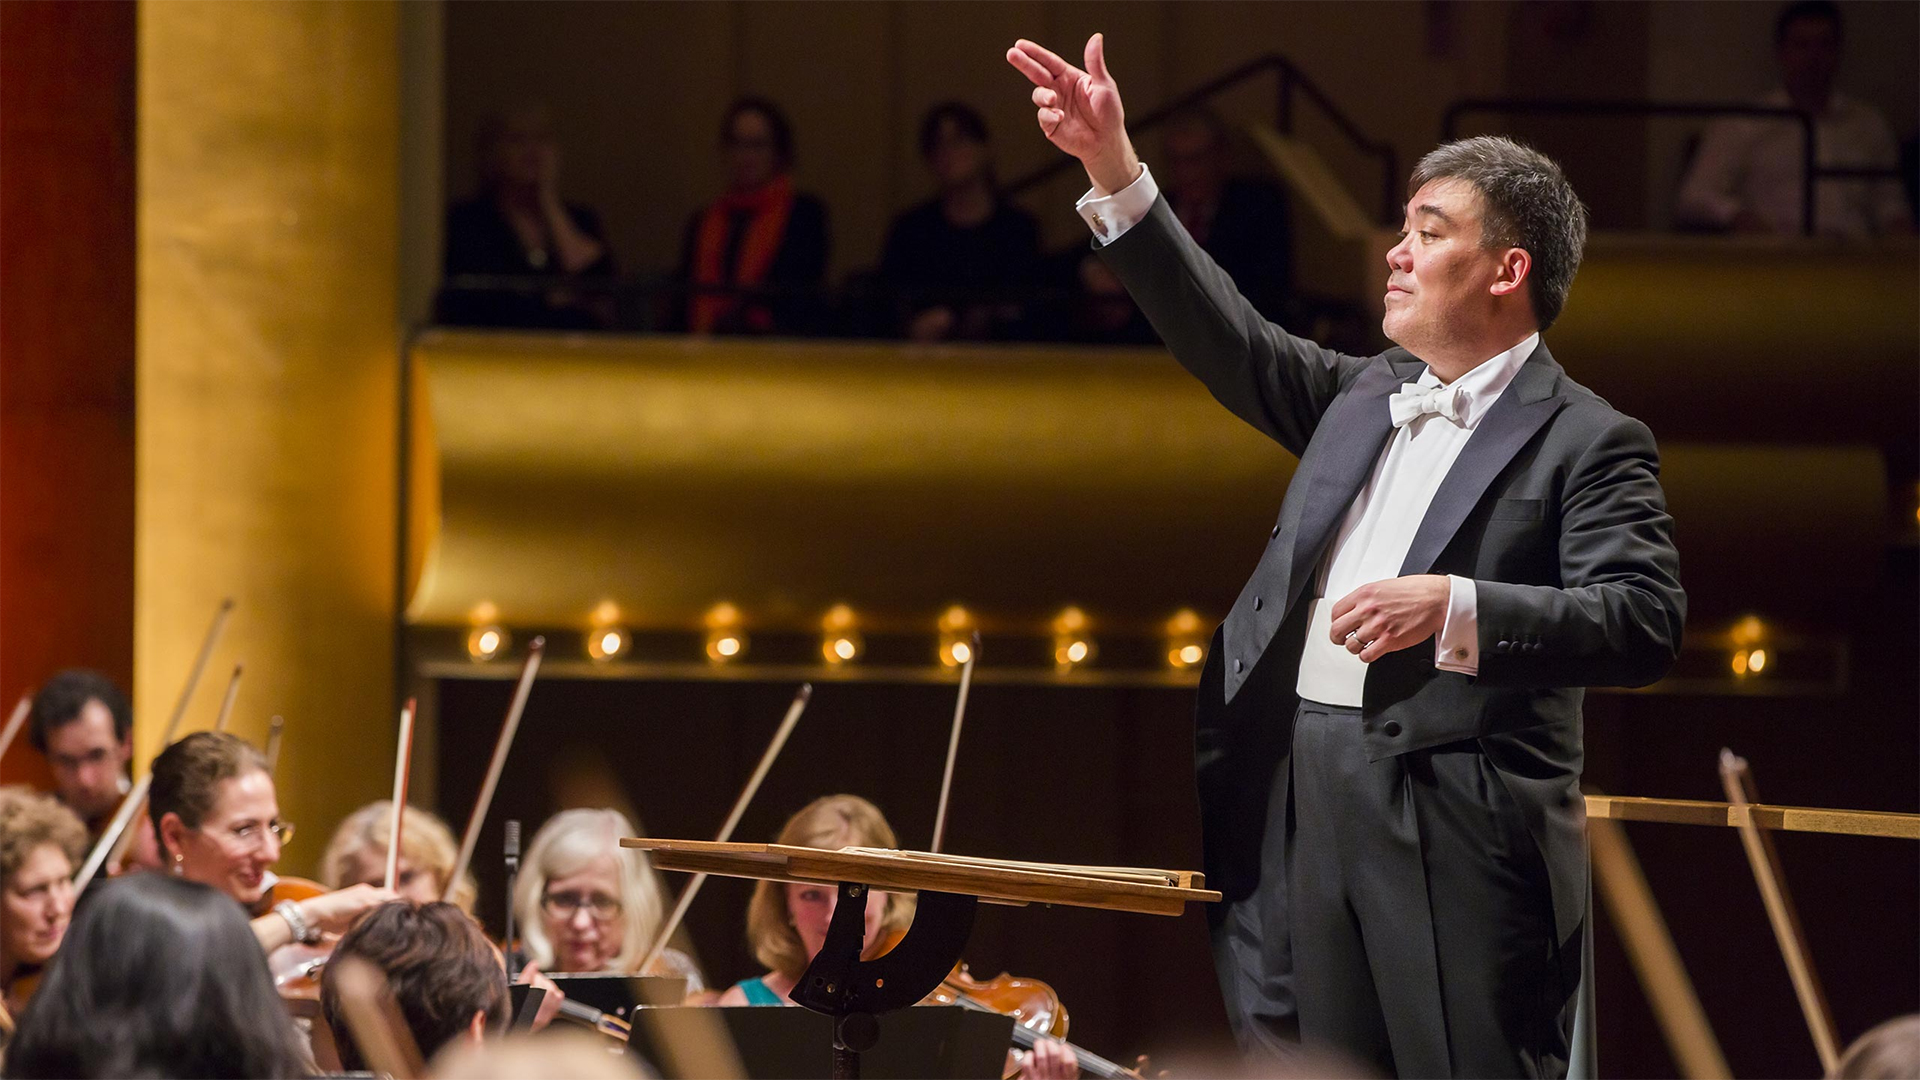 P2 Koncerten: Carl Nielsen og Alan Gilbert i Zürich